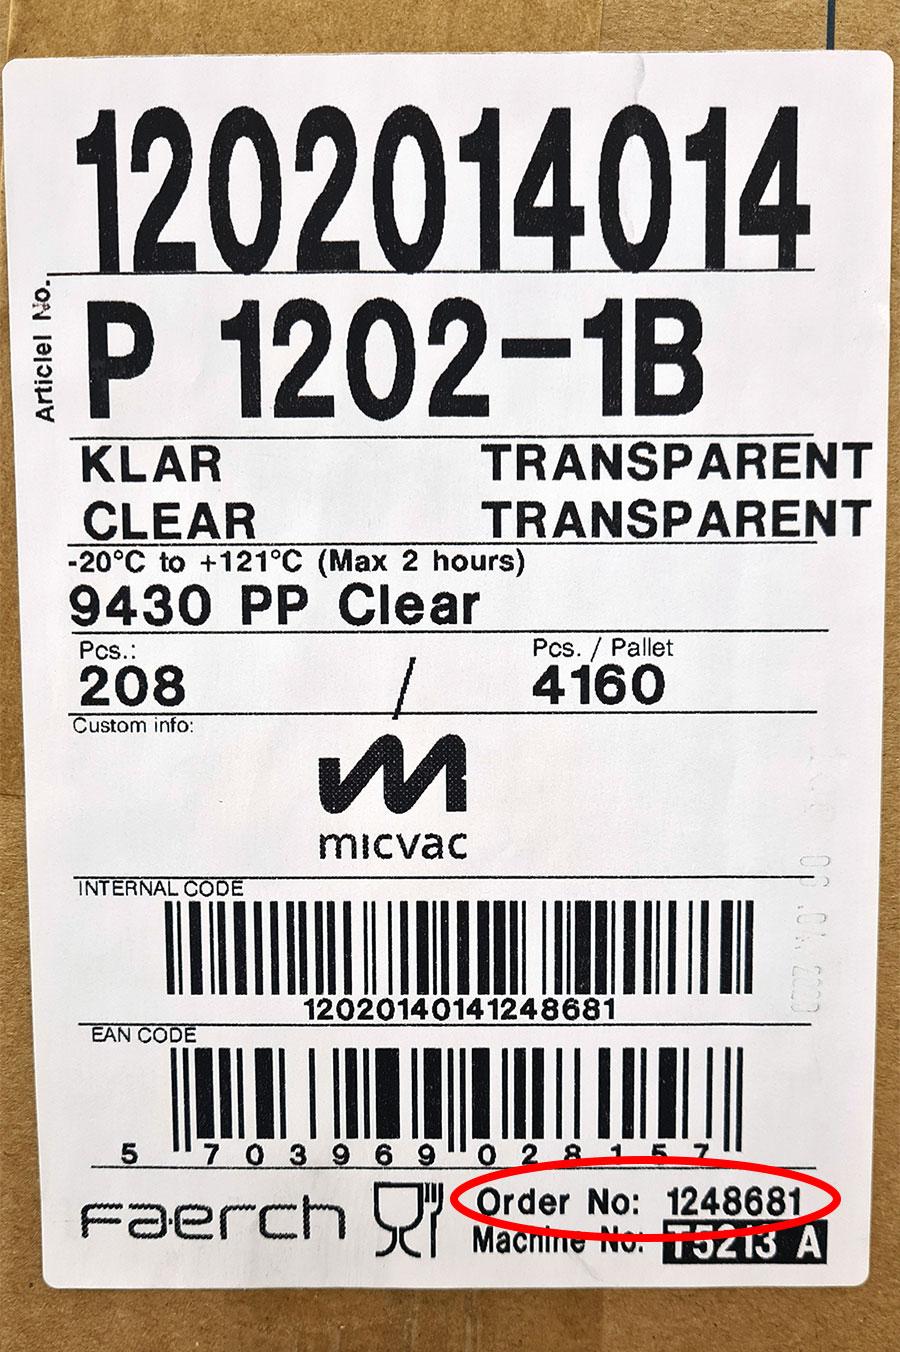 Tray, identification code